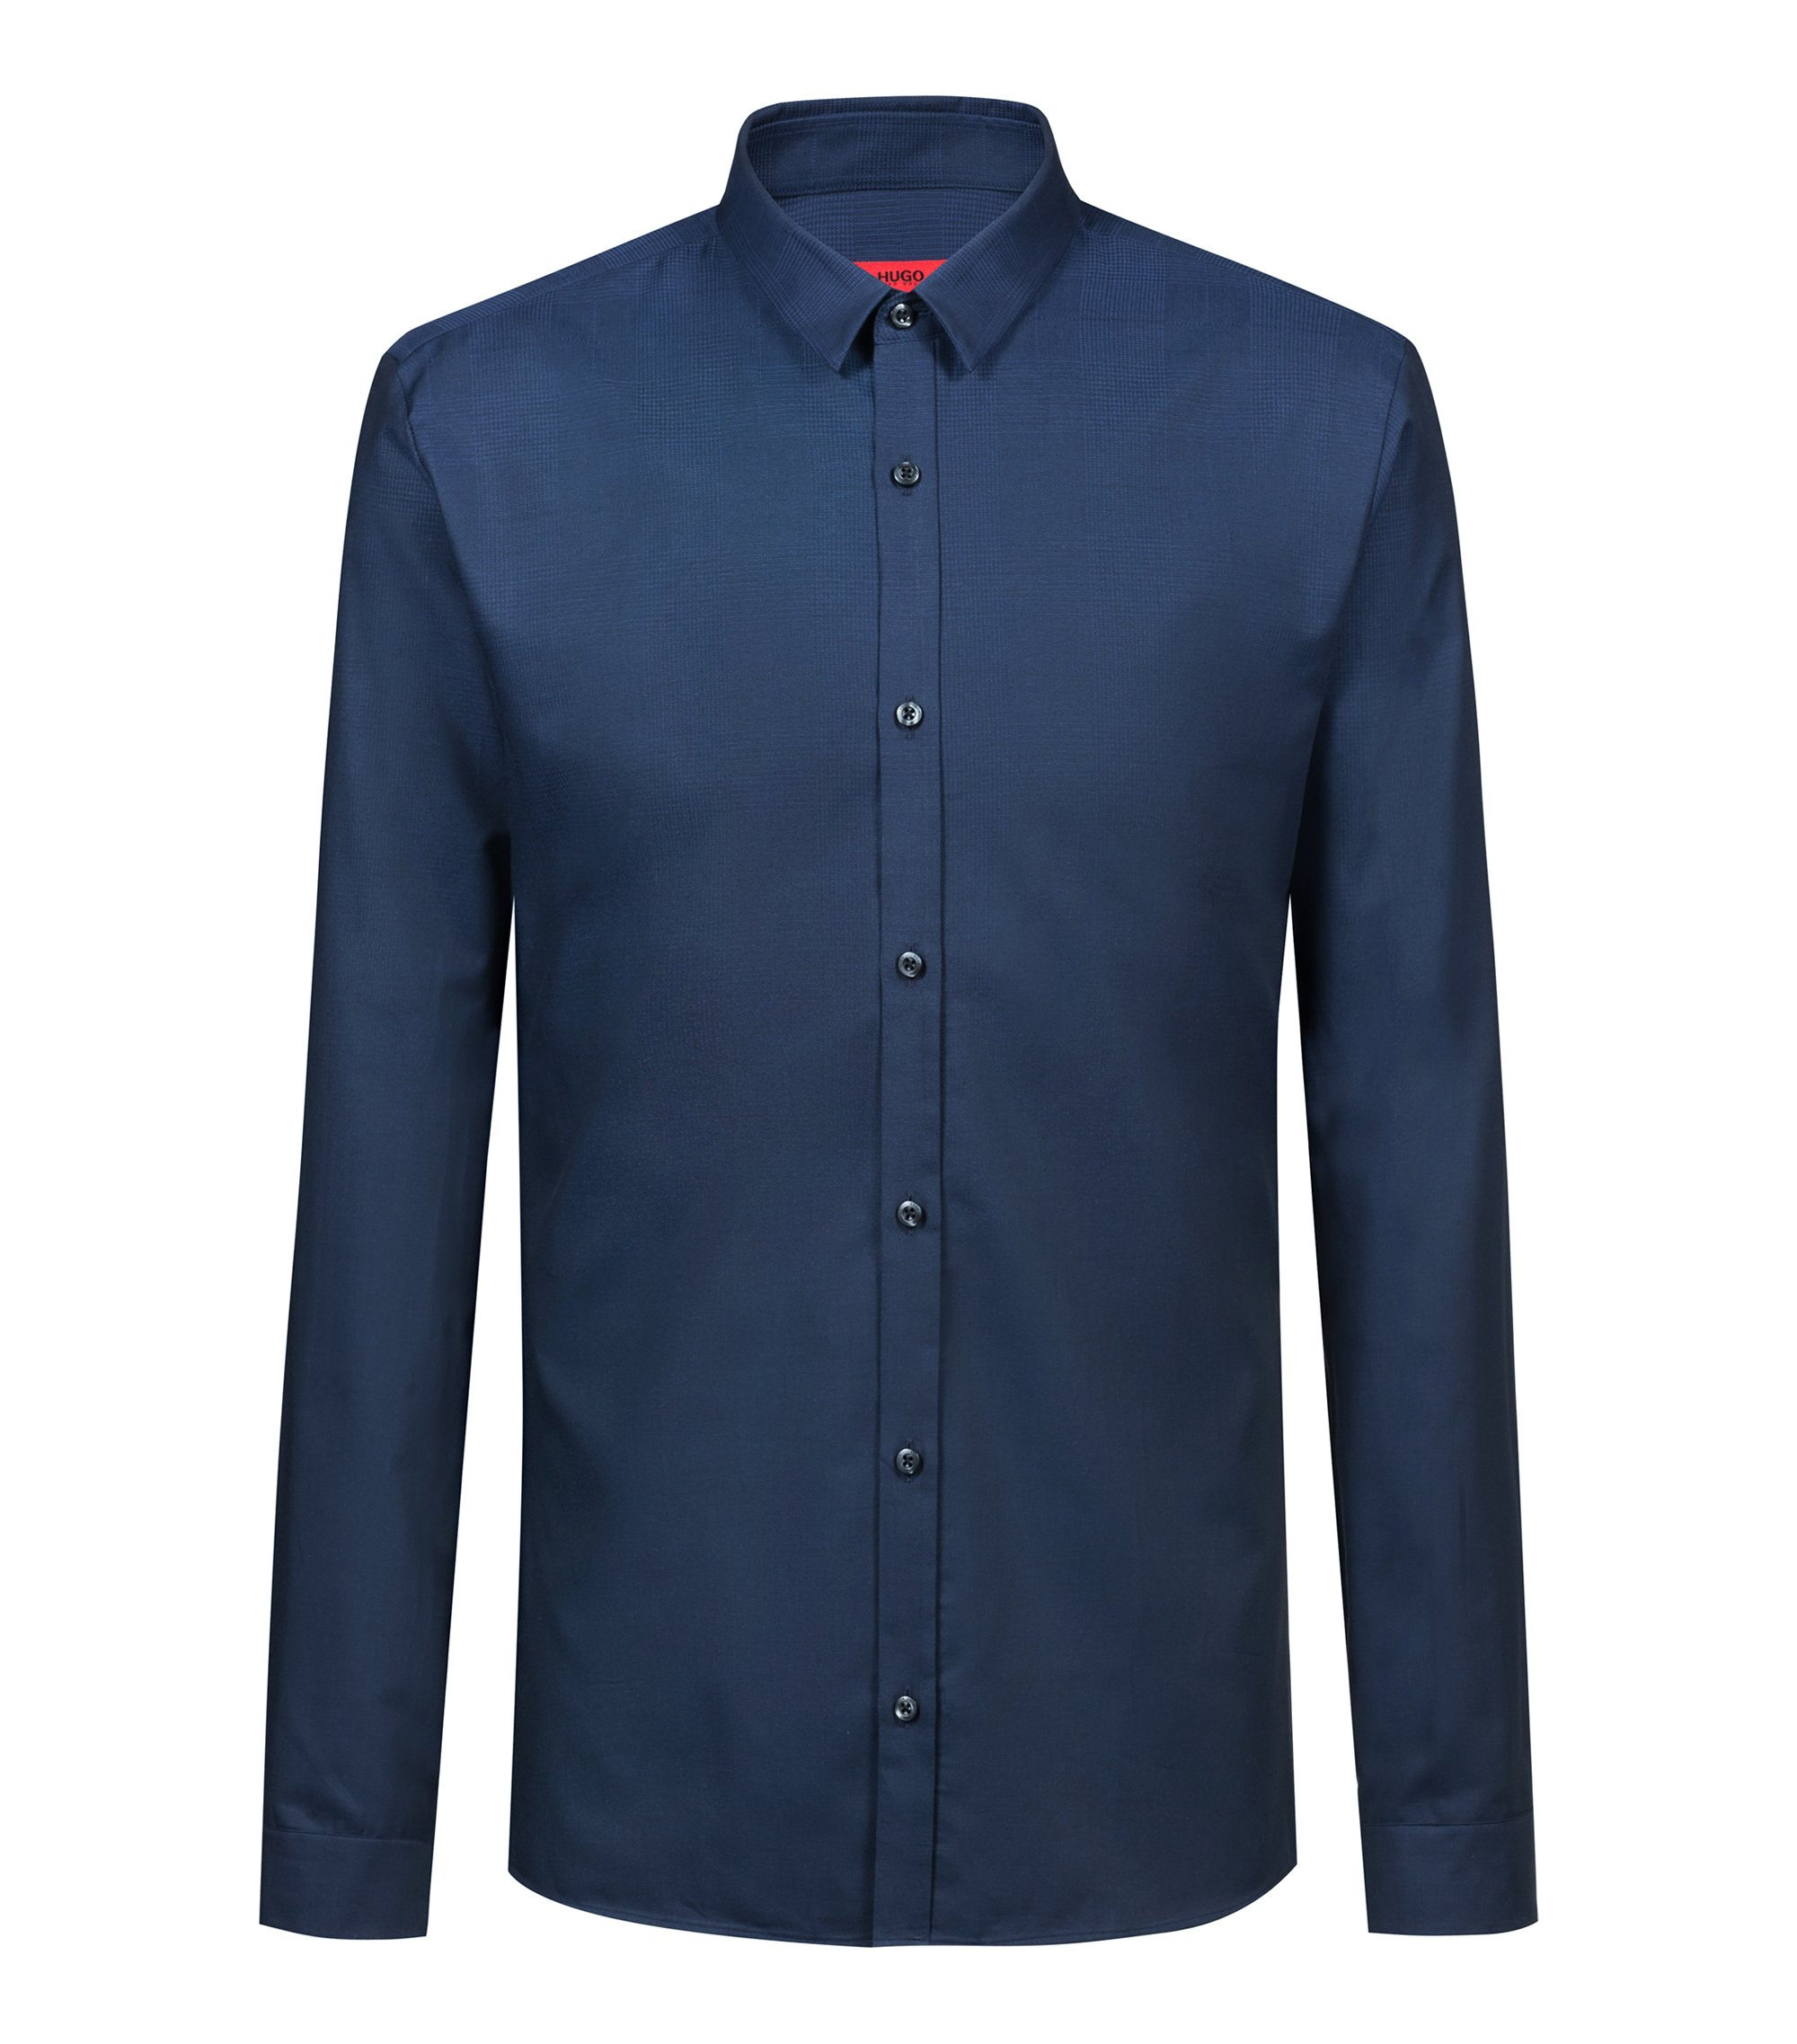 Extra-slim-fit shirt in dégradé check cotton, Dark Blue